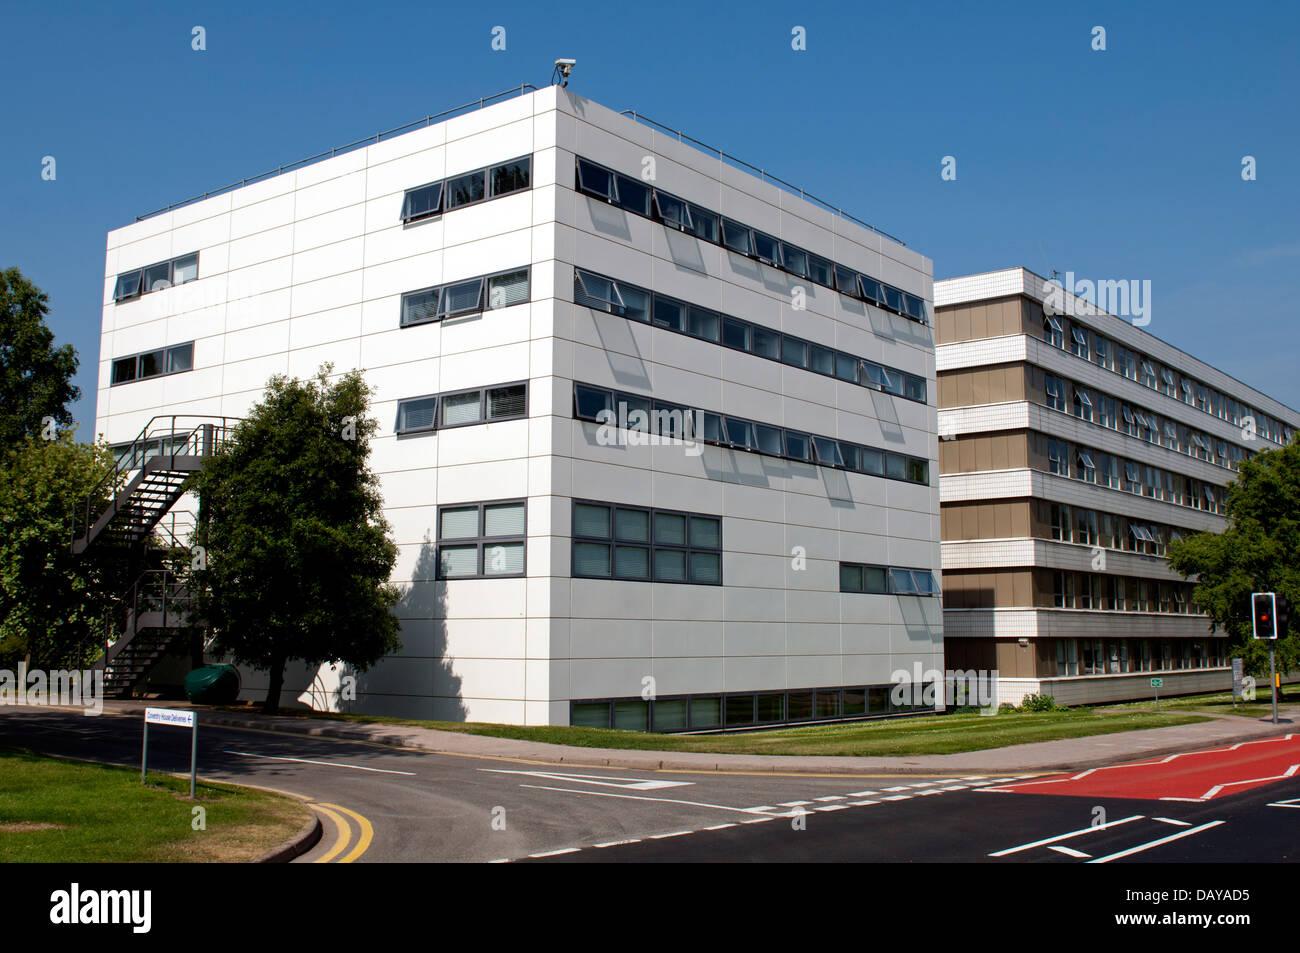 Department of Psychology, University of Warwick, UK - Stock Image